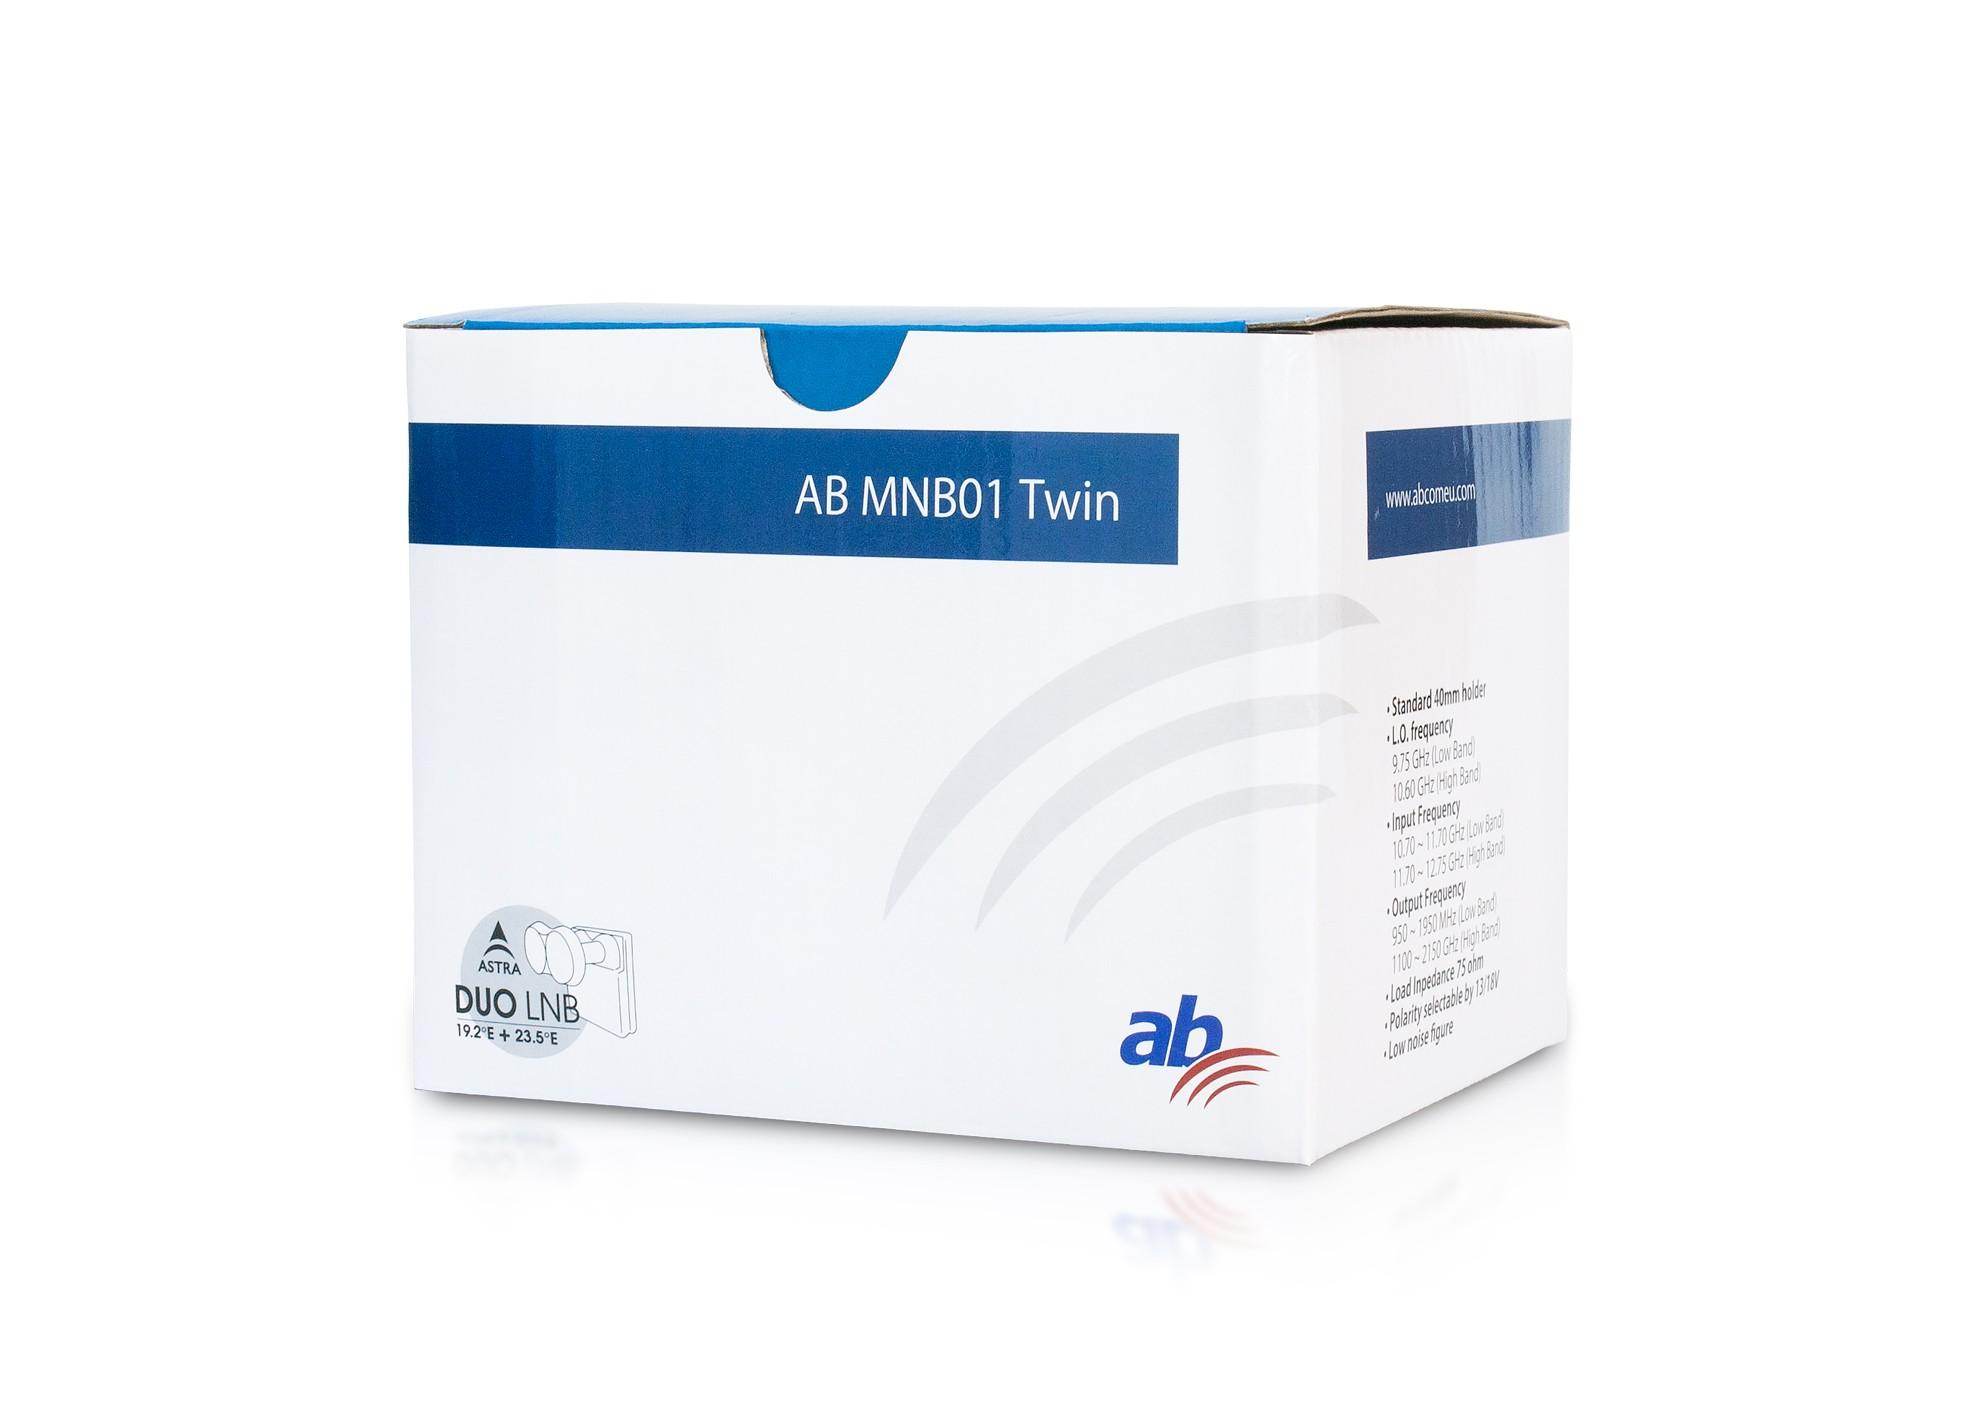 AB LNB01 Monoblock 4,3 Twin 0,1dB v2